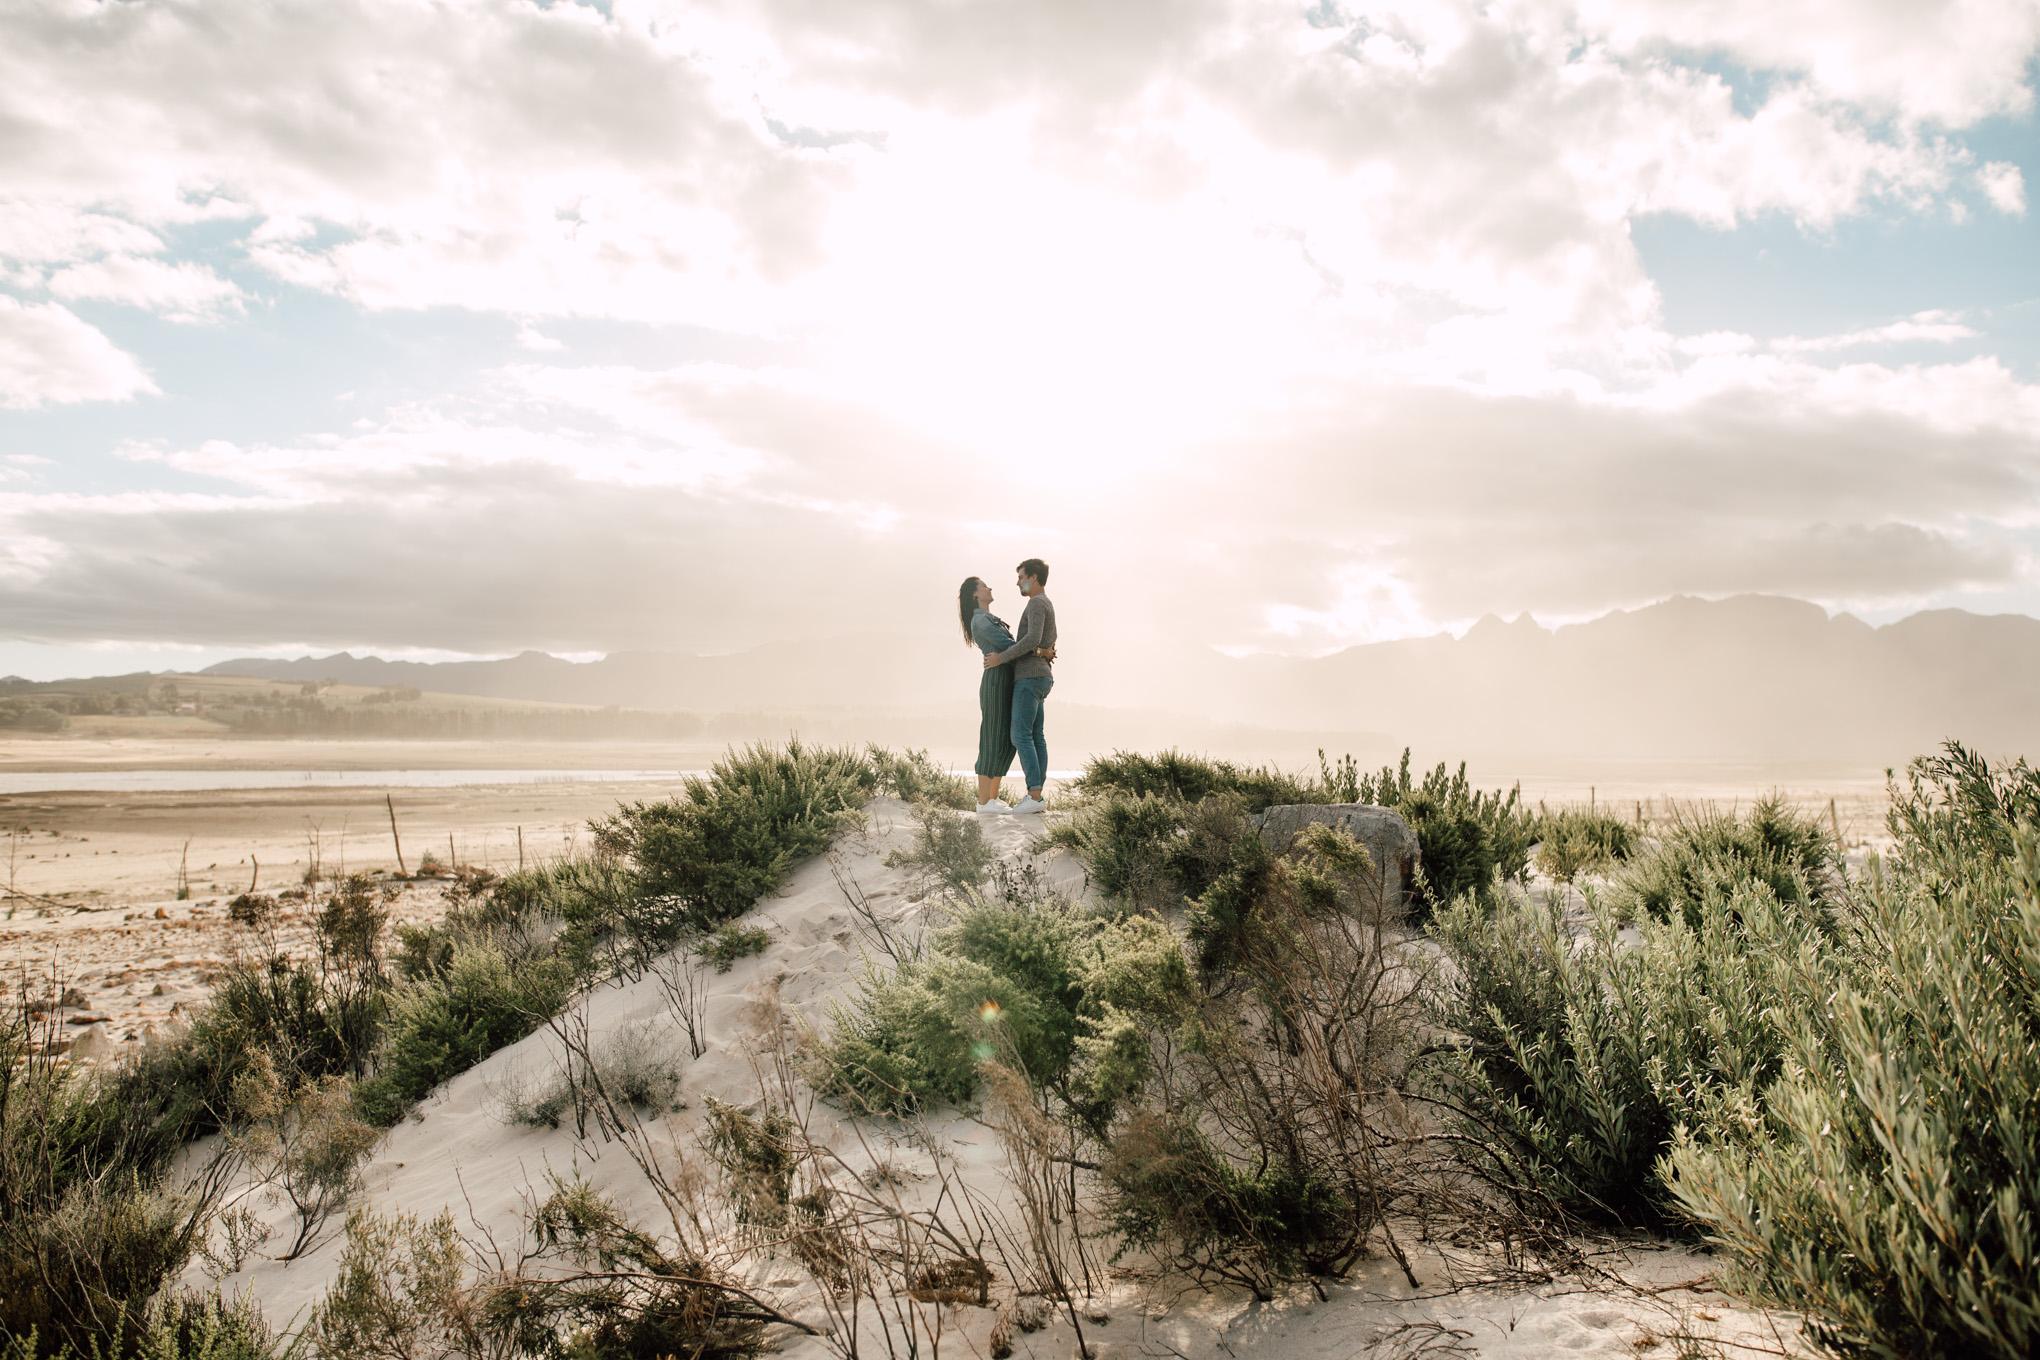 Cape-Town-Pia-Anna-Christian-Wedding-Photography-South-Africa-KF-23.jpg